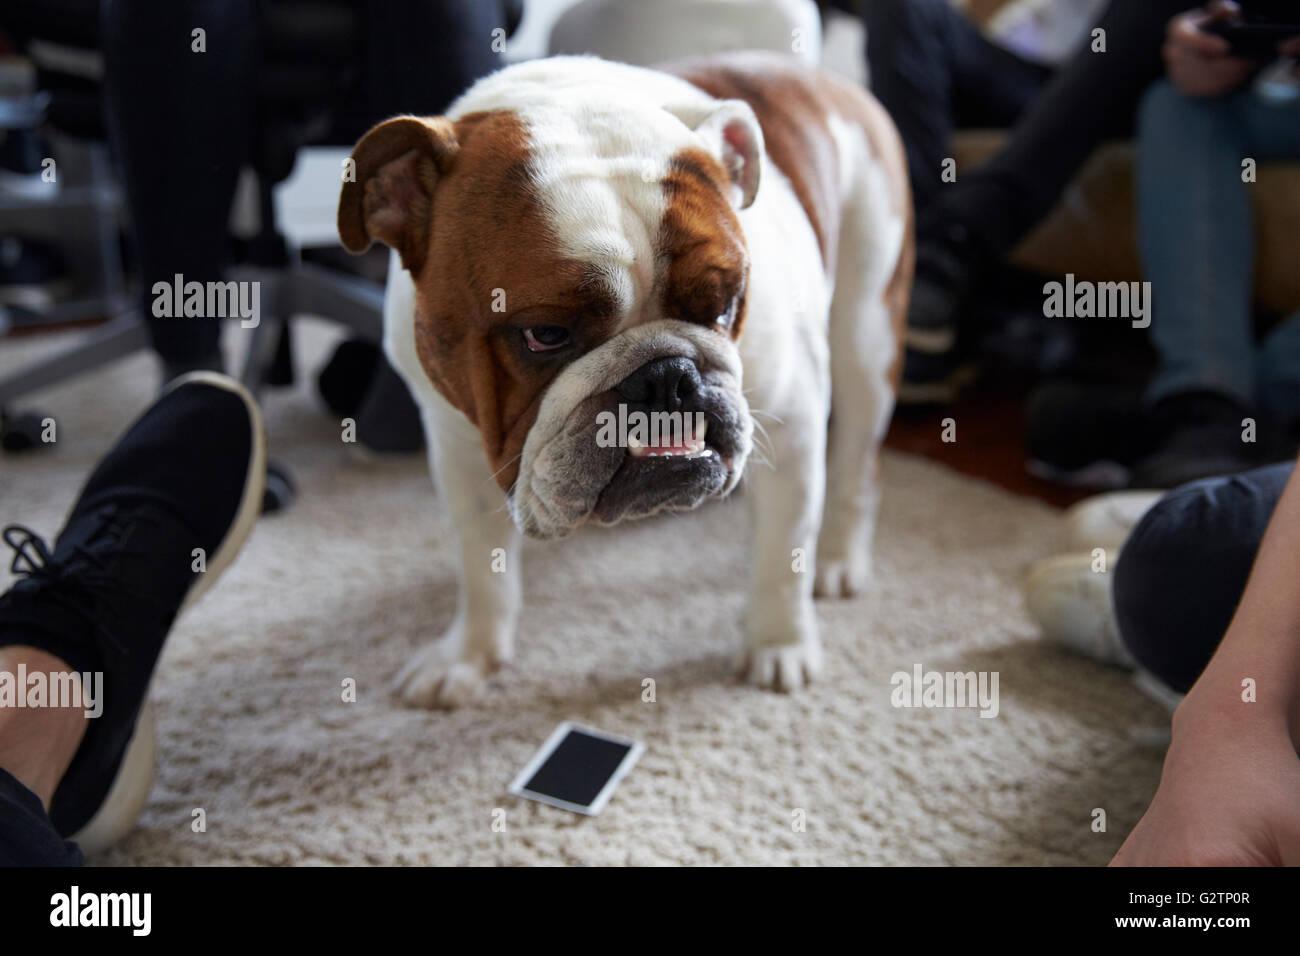 Portrait Of English Bulldog Standing On Rug - Stock Image